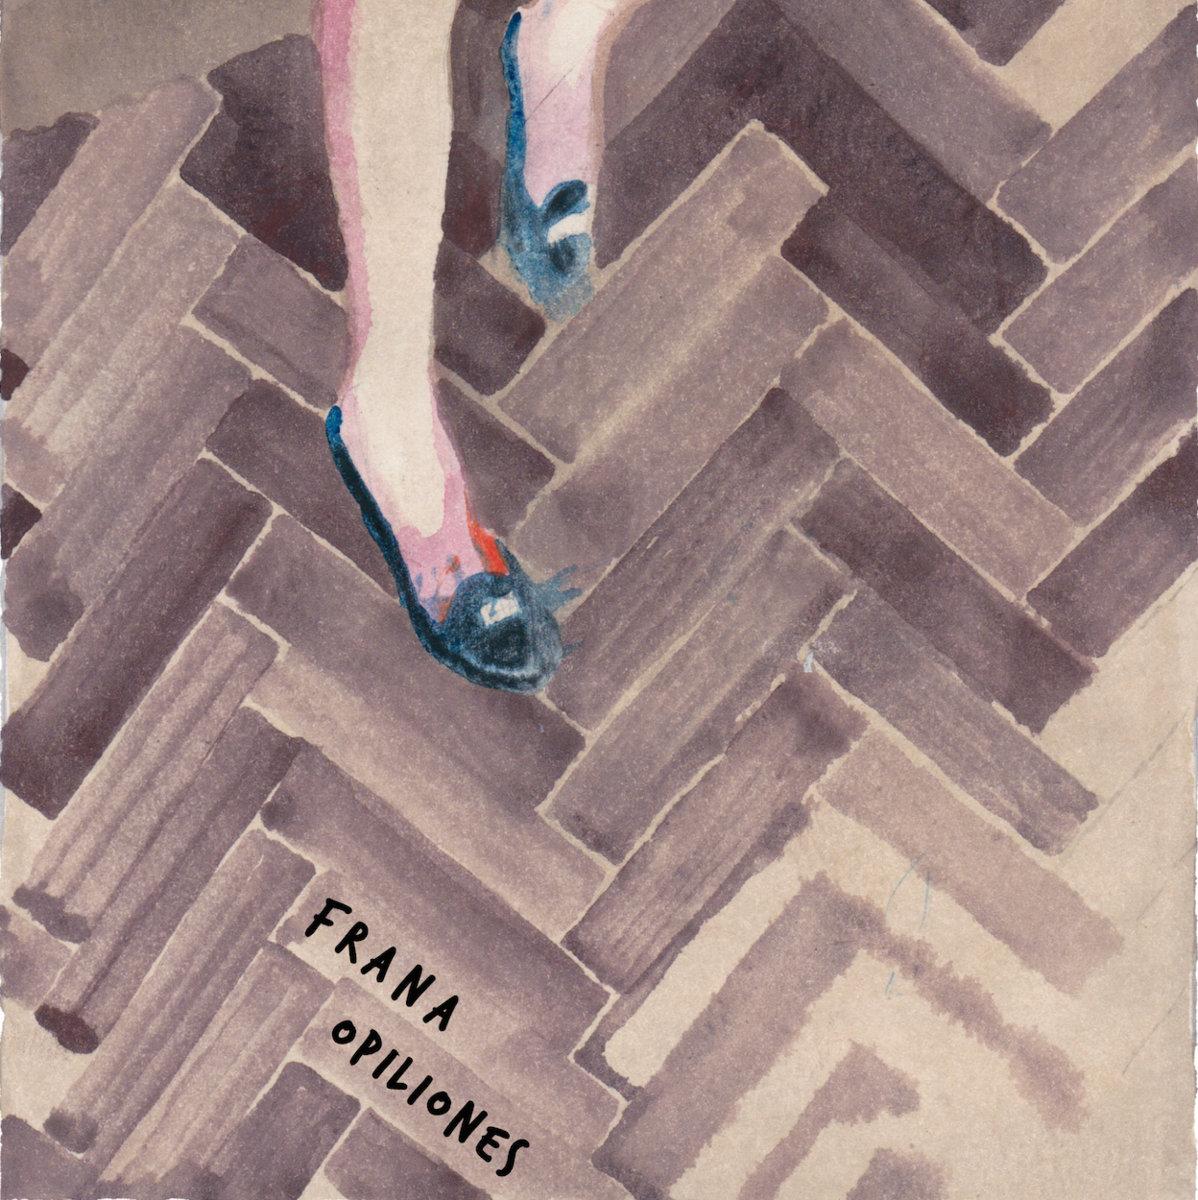 Frana / Opiliones - Split